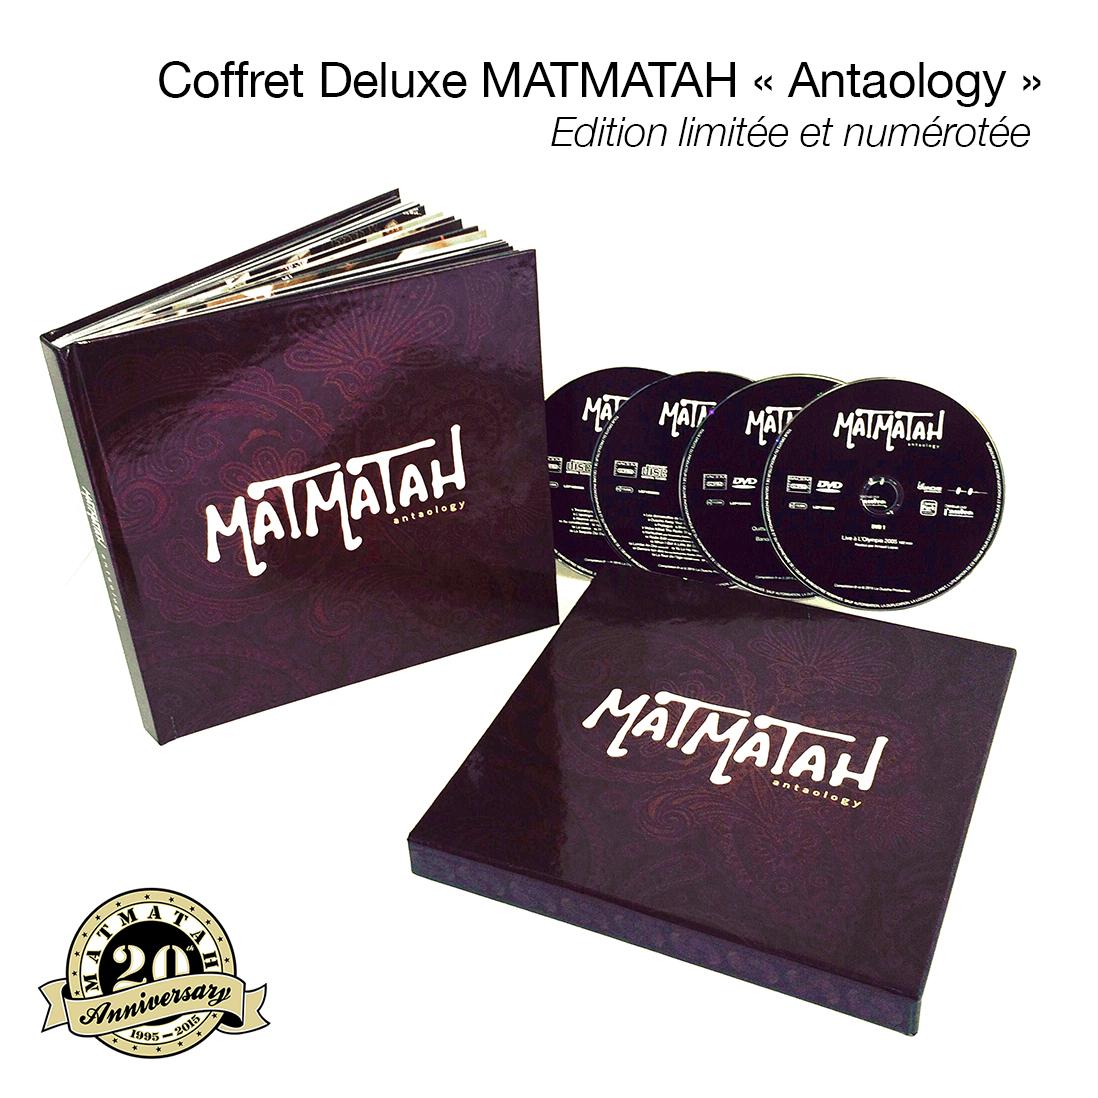 Matmatah - ANtaology - coffret deluxe